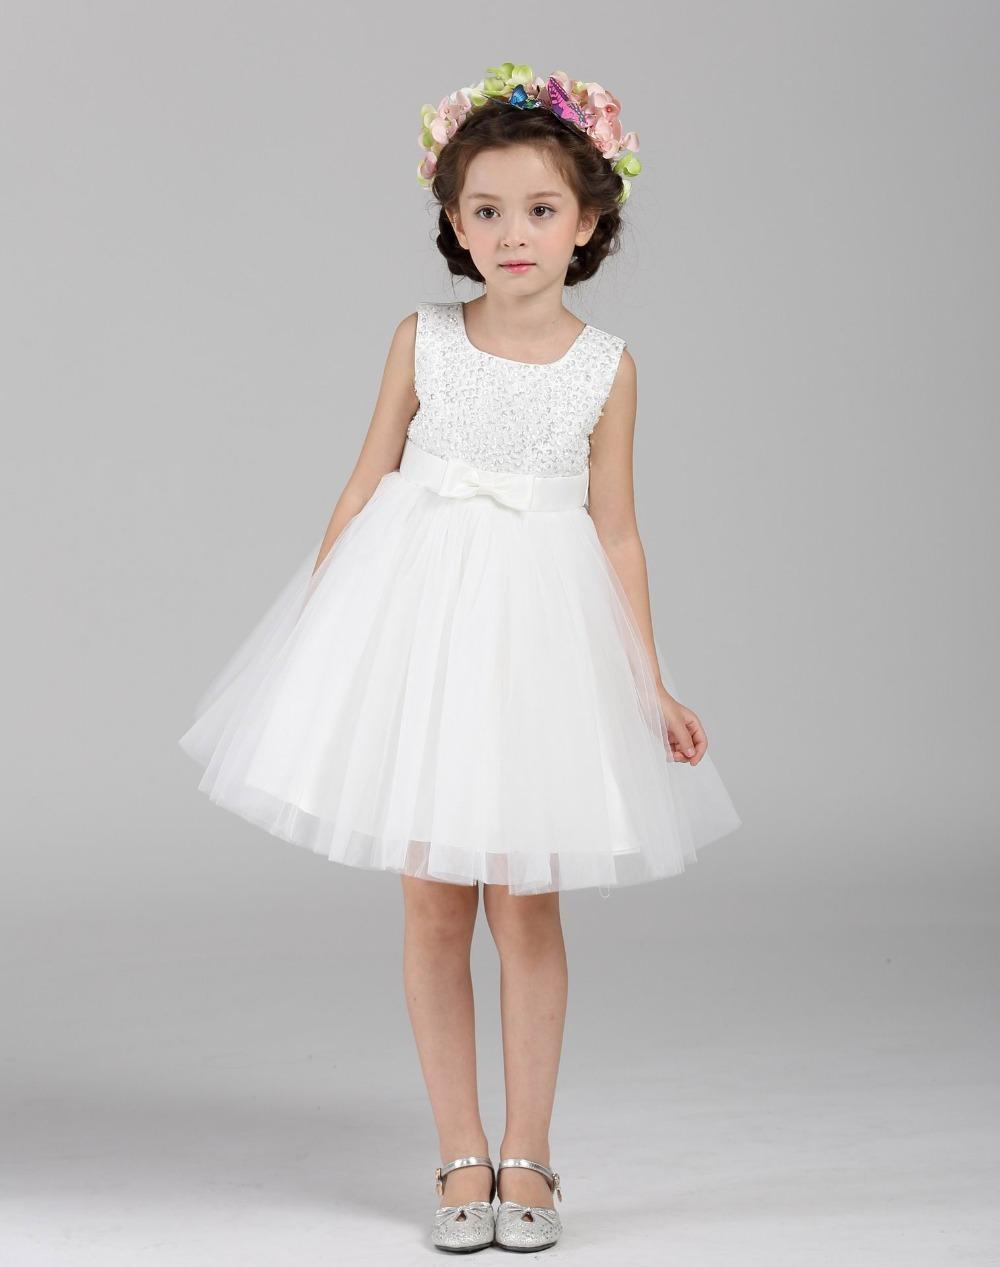 Zoeflower 2015 Girl Dresses Sequin Lace Gauze Slip Dress Princess Tiered Dress Party Dress 3-8T Z148